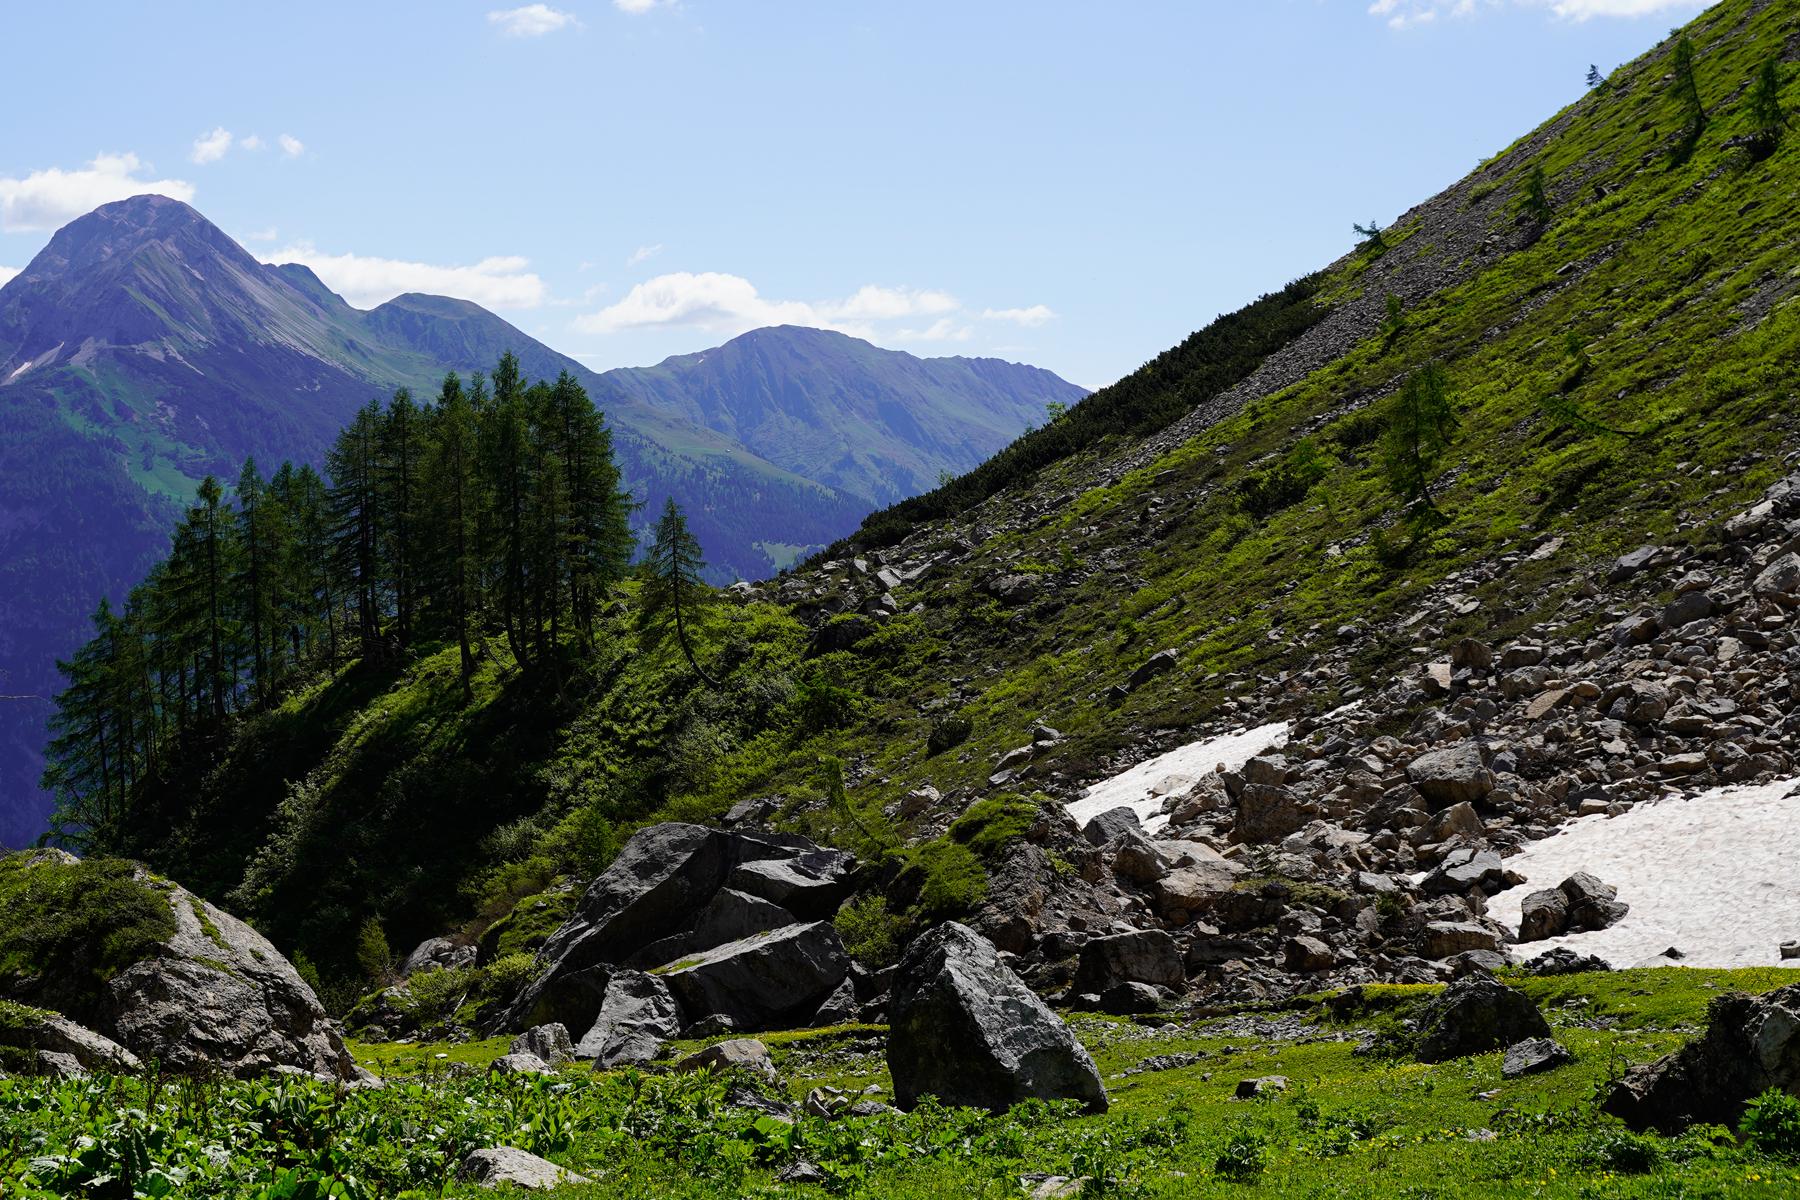 Carinthian mountains